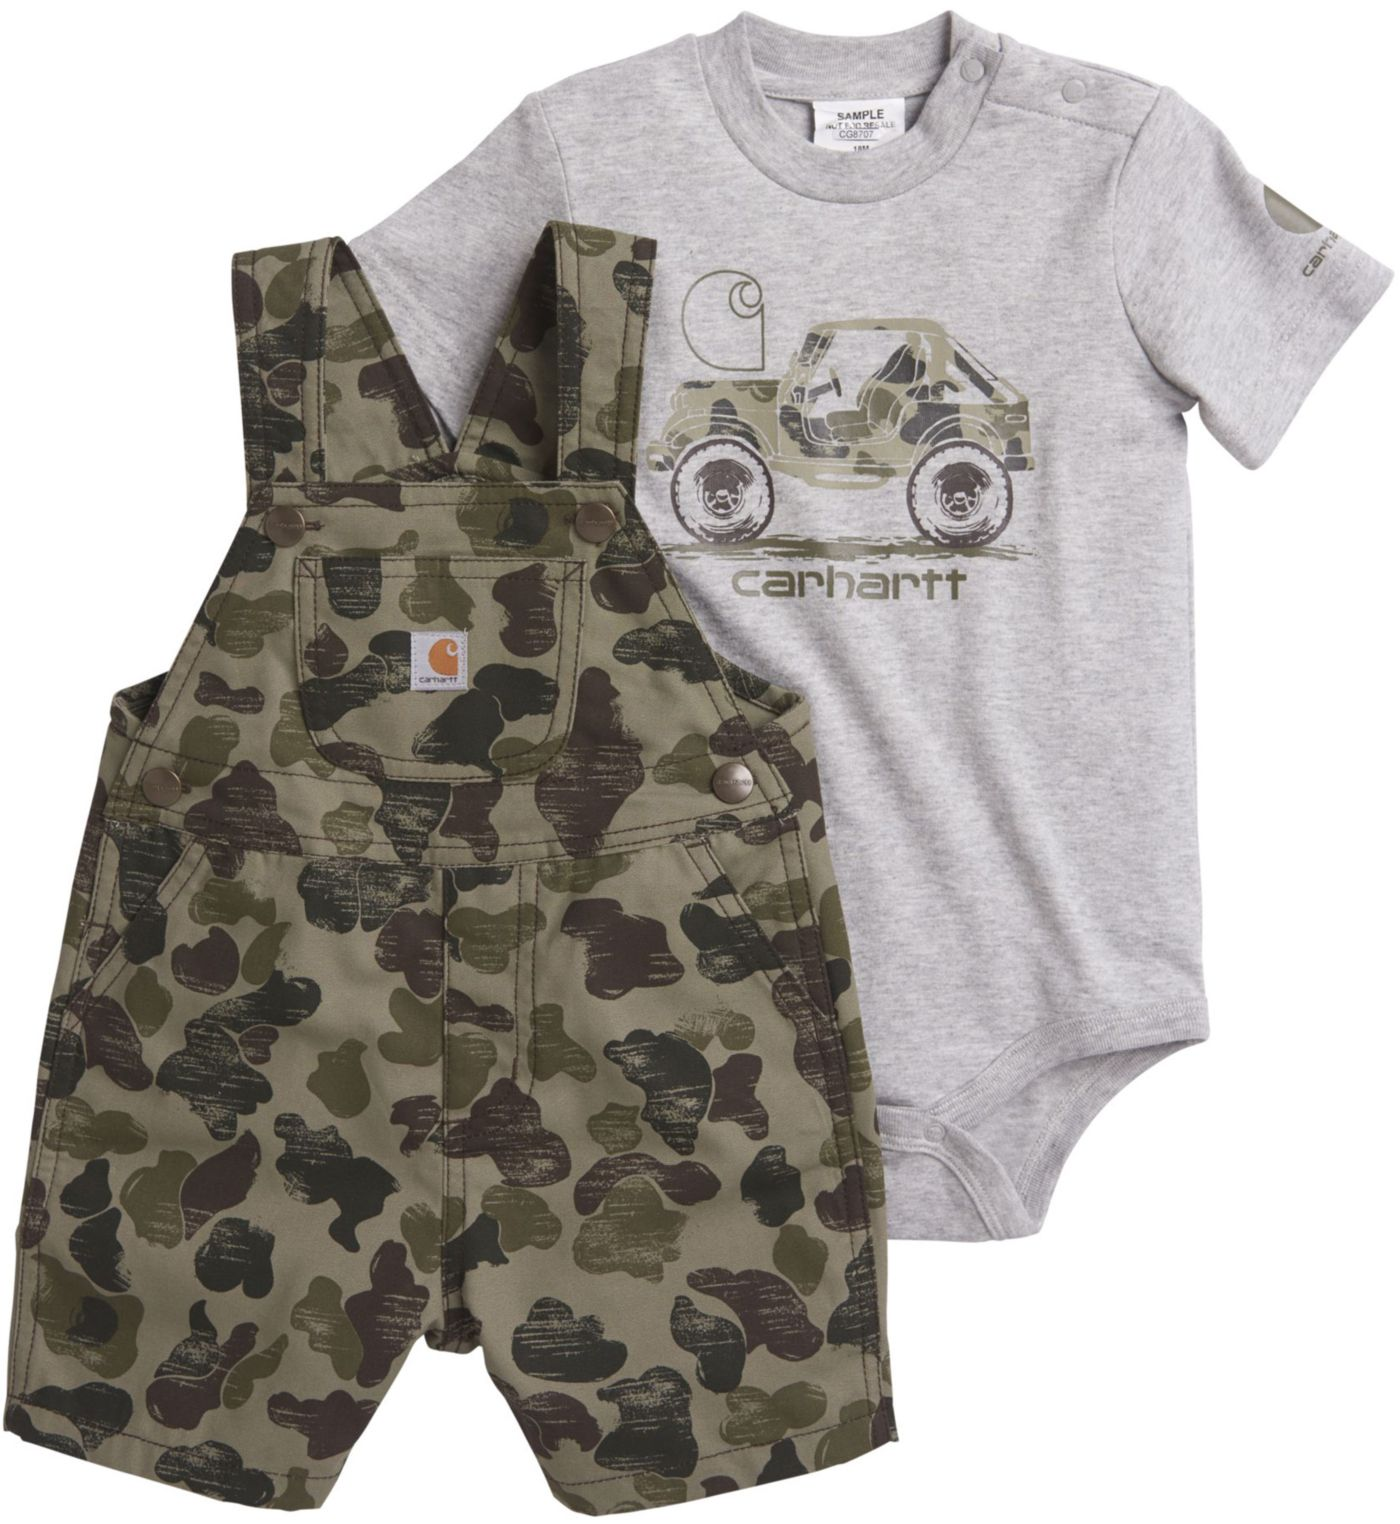 Carhartt Infant Boys' 2-Piece Onesie and Camo Shortall Set